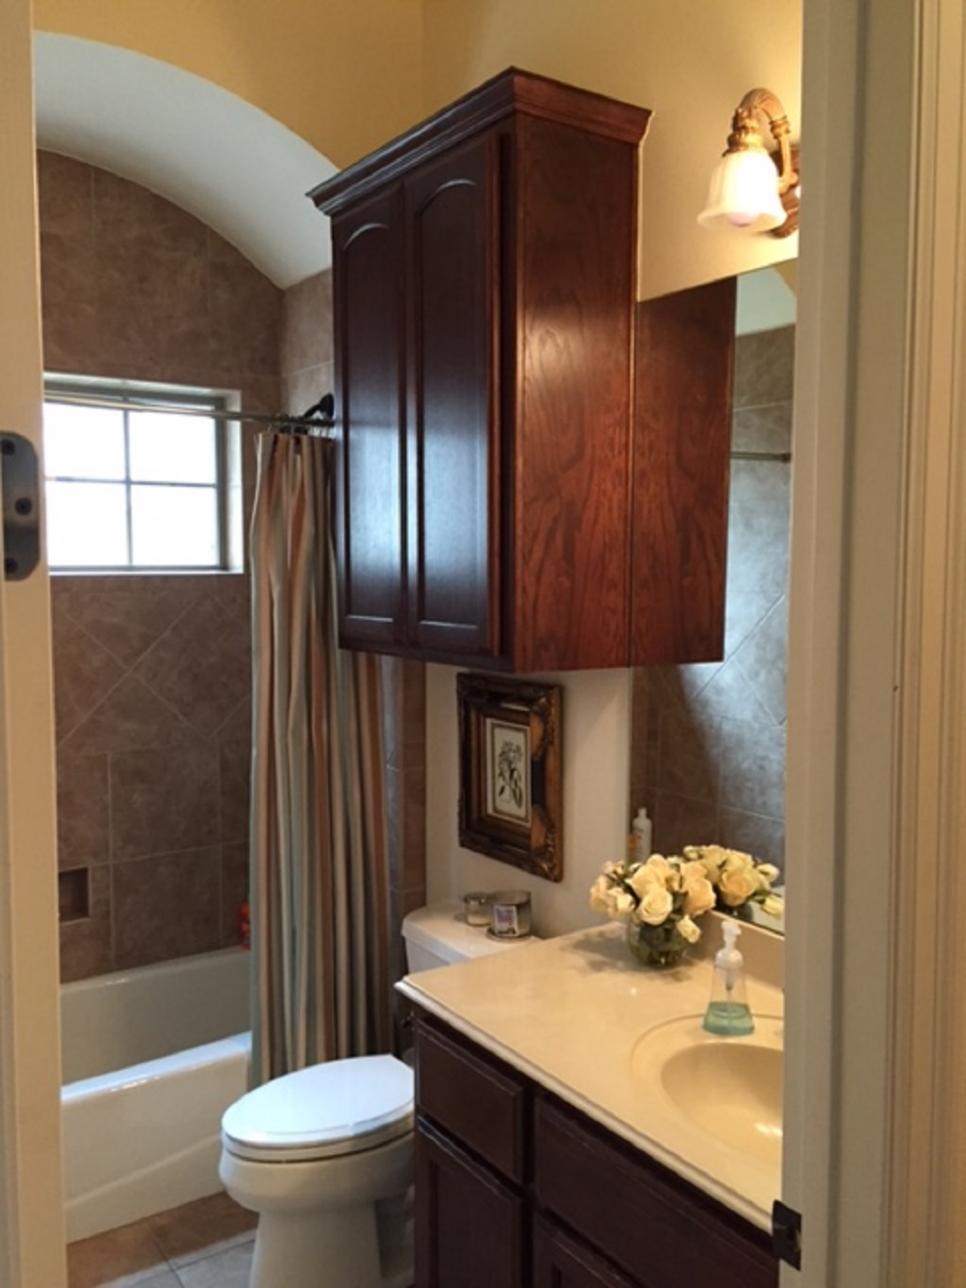 remodeling bathroom before-and-after bathroom remodels on a budget | hgtv CNEFKQZ